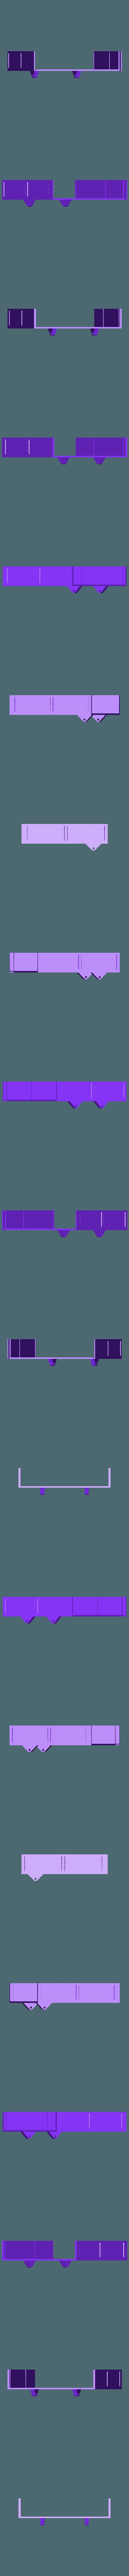 TruckV3_Props_flatbed_B.STL Download STL file 3D Printed RC Truck V3 • 3D print model, MrCrankyface